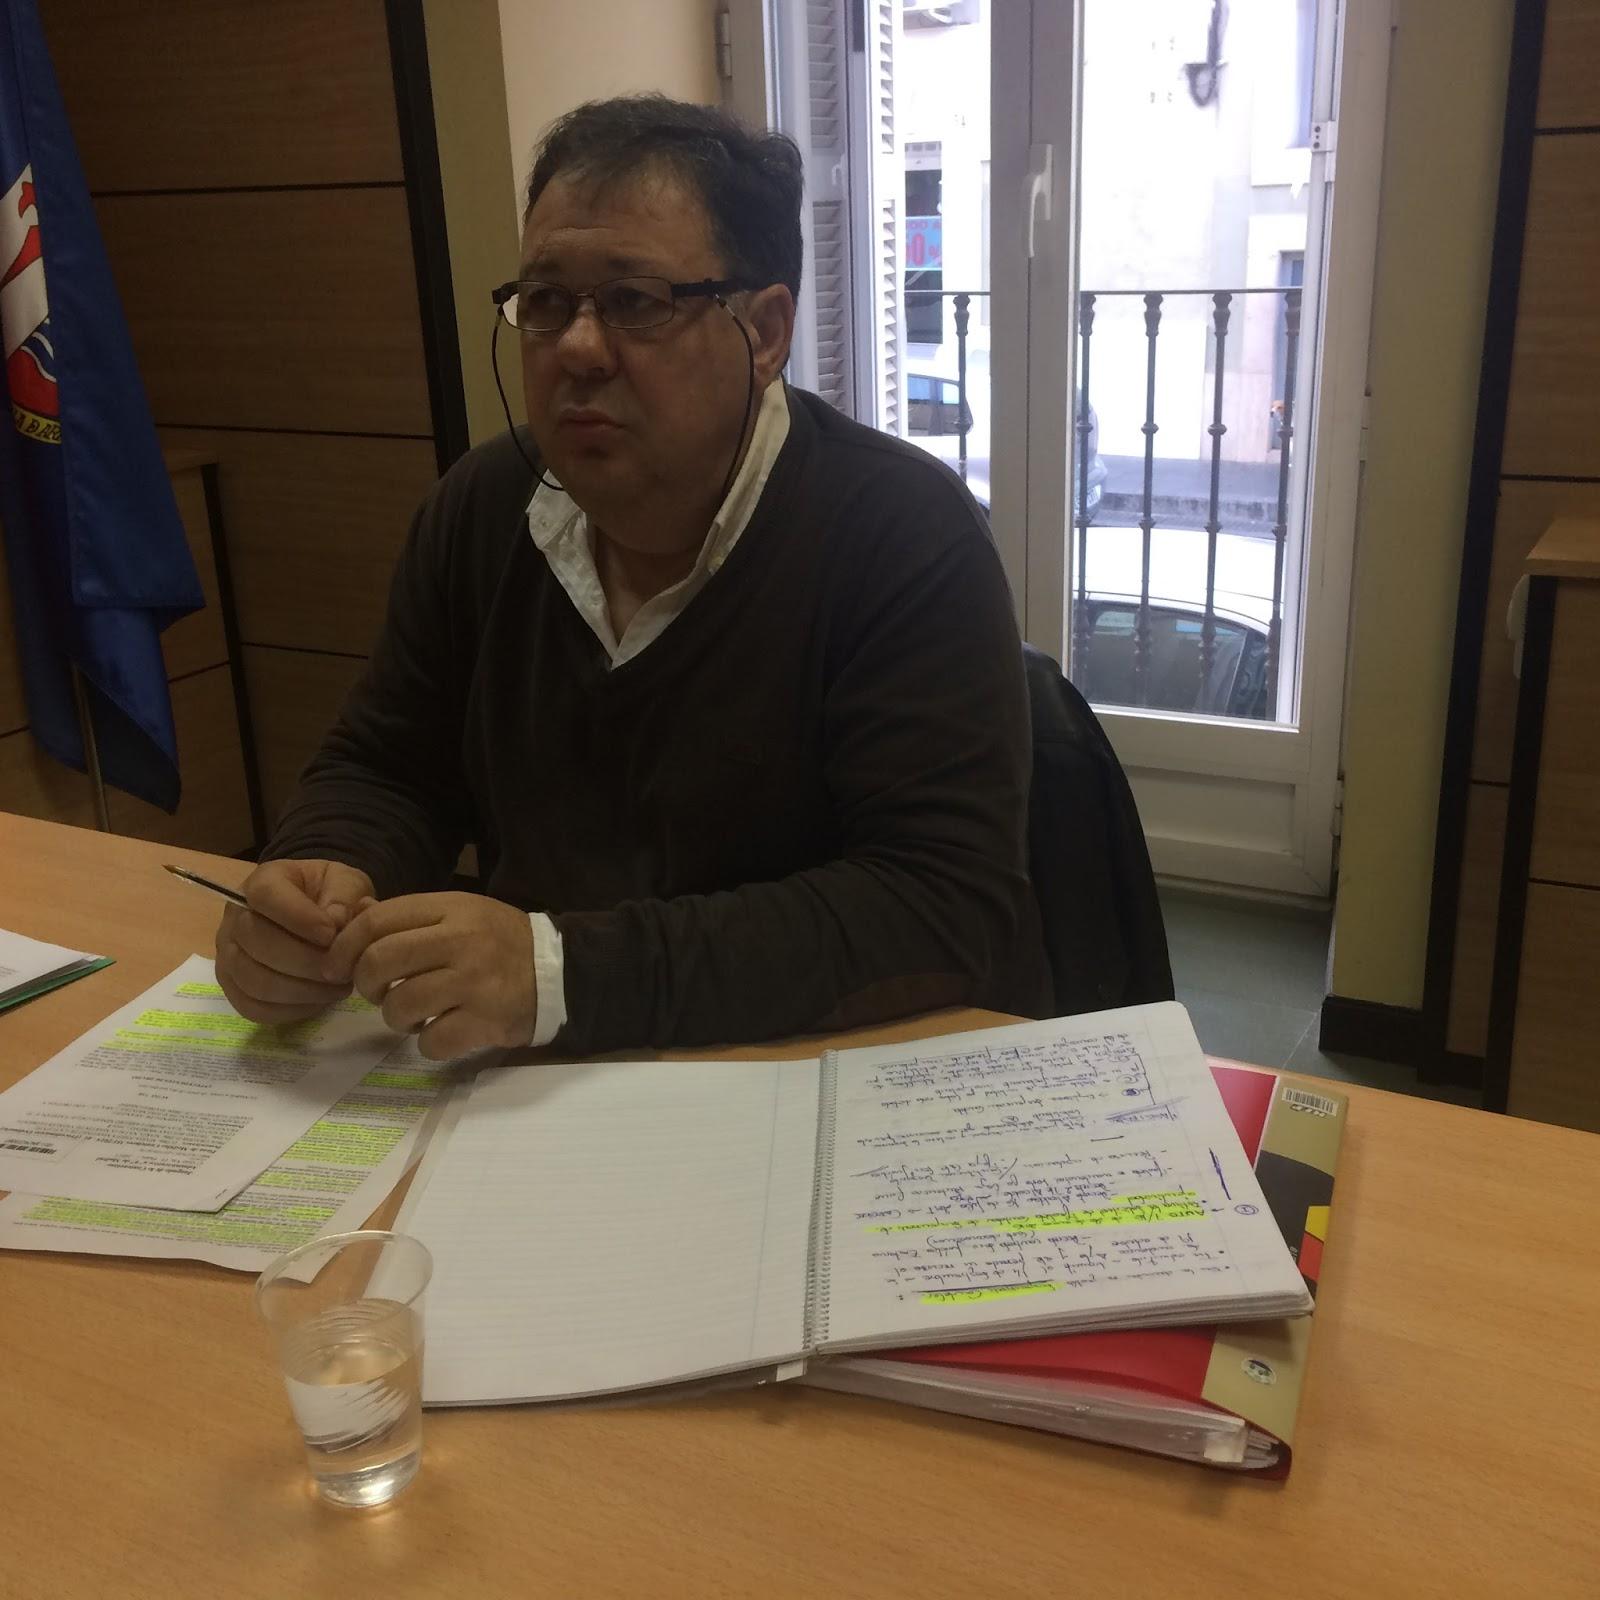 Heraldo de aranjuez in par anuncia la suspensi n cautelar for Juzgados de aranjuez